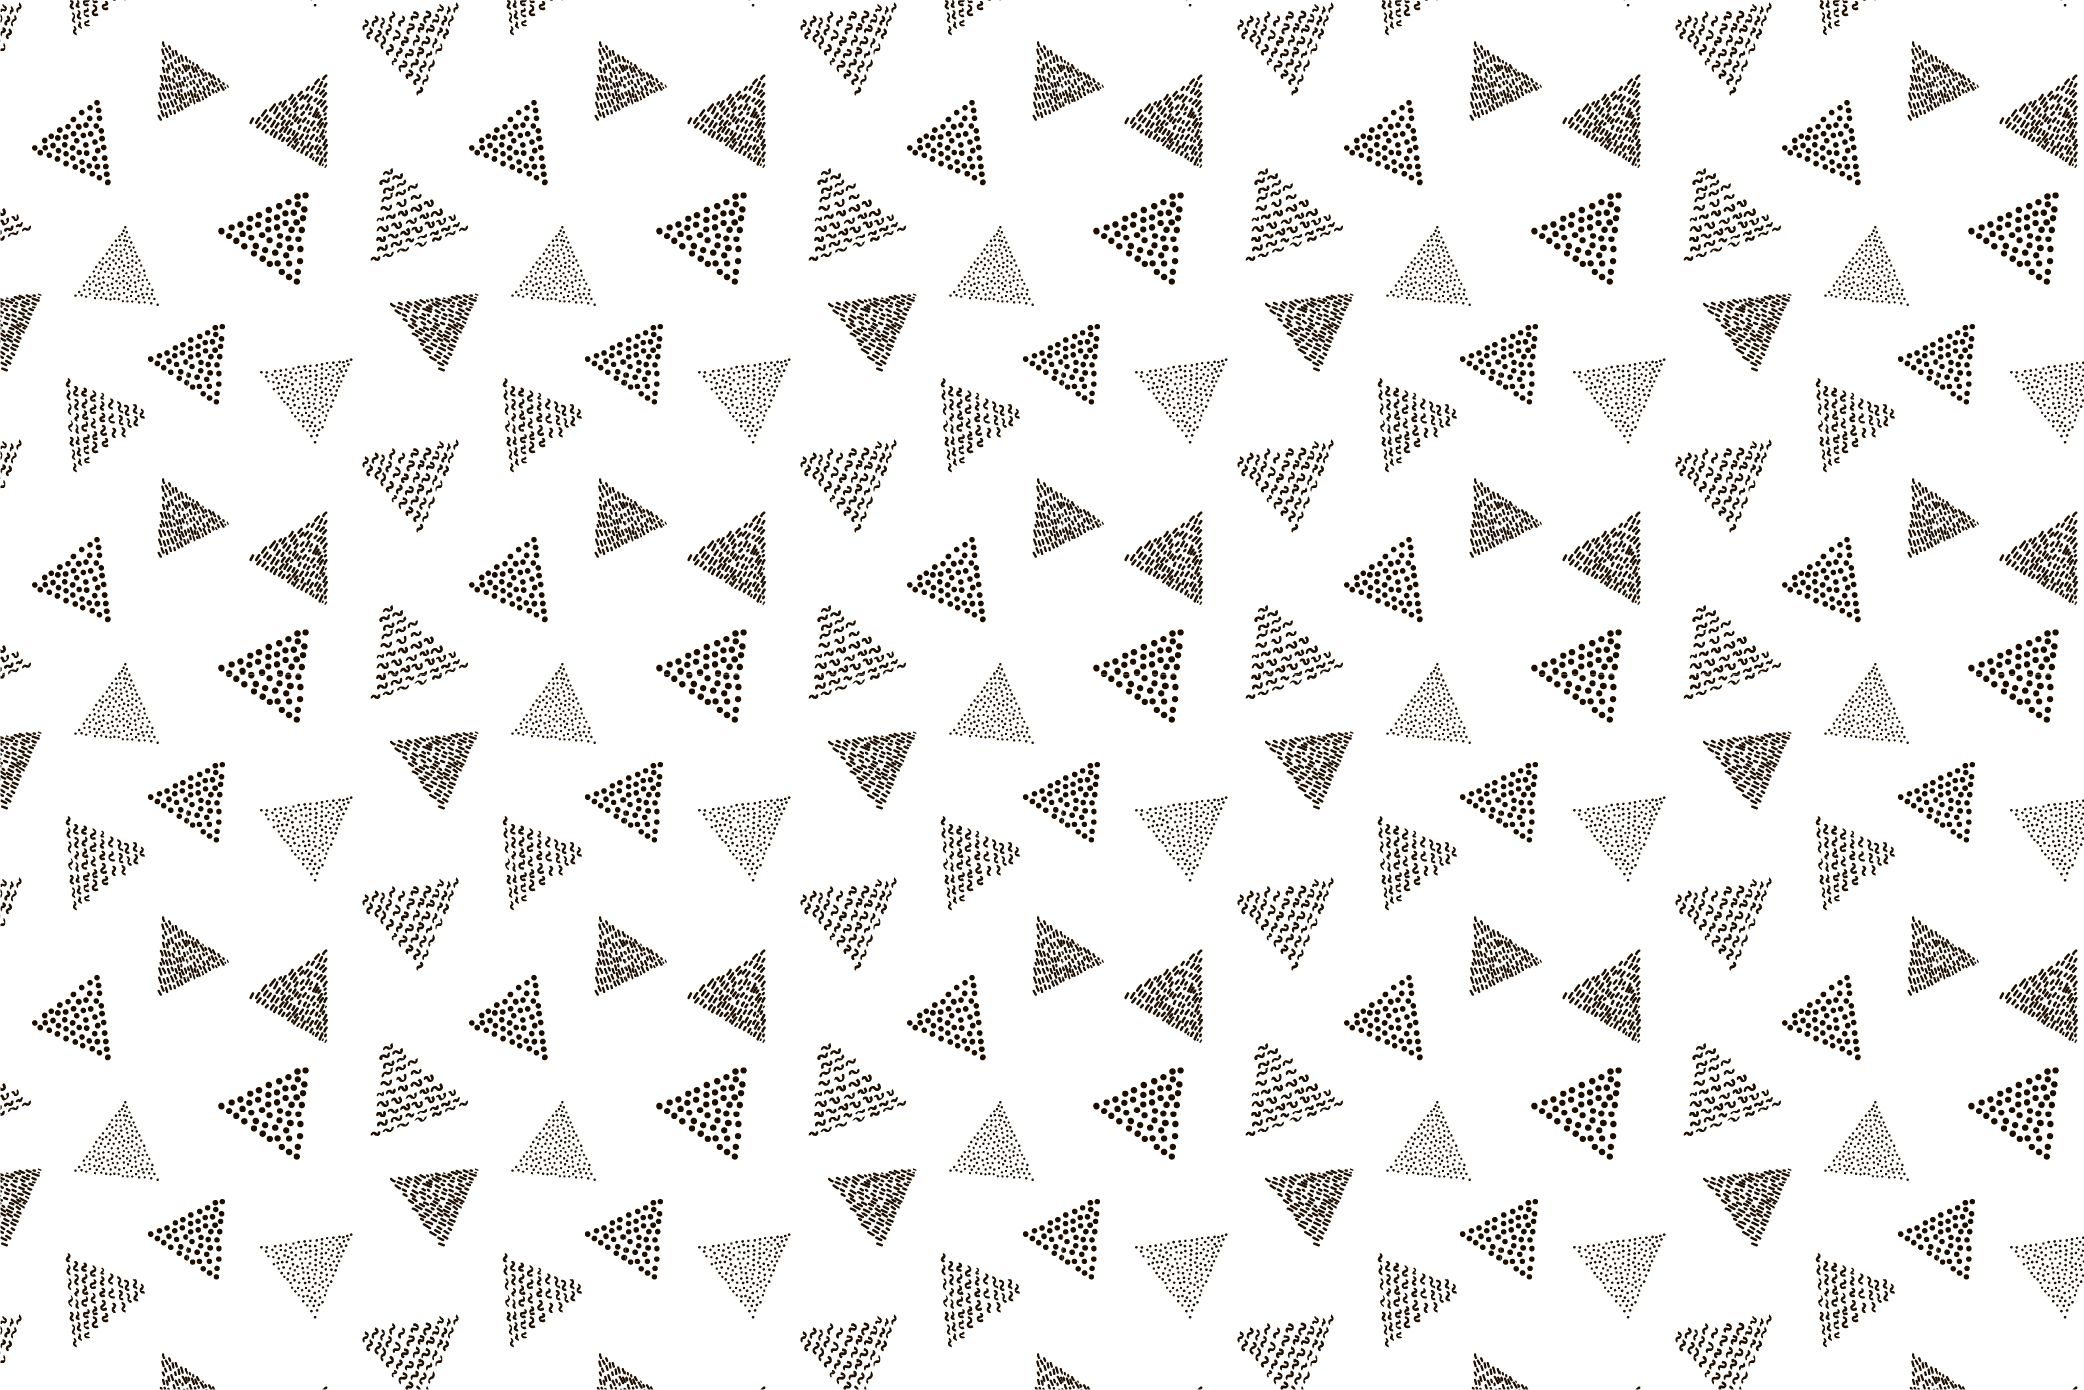 9 Geometric seamless patterns. Ai, EPS, JPG, SVG example image 7